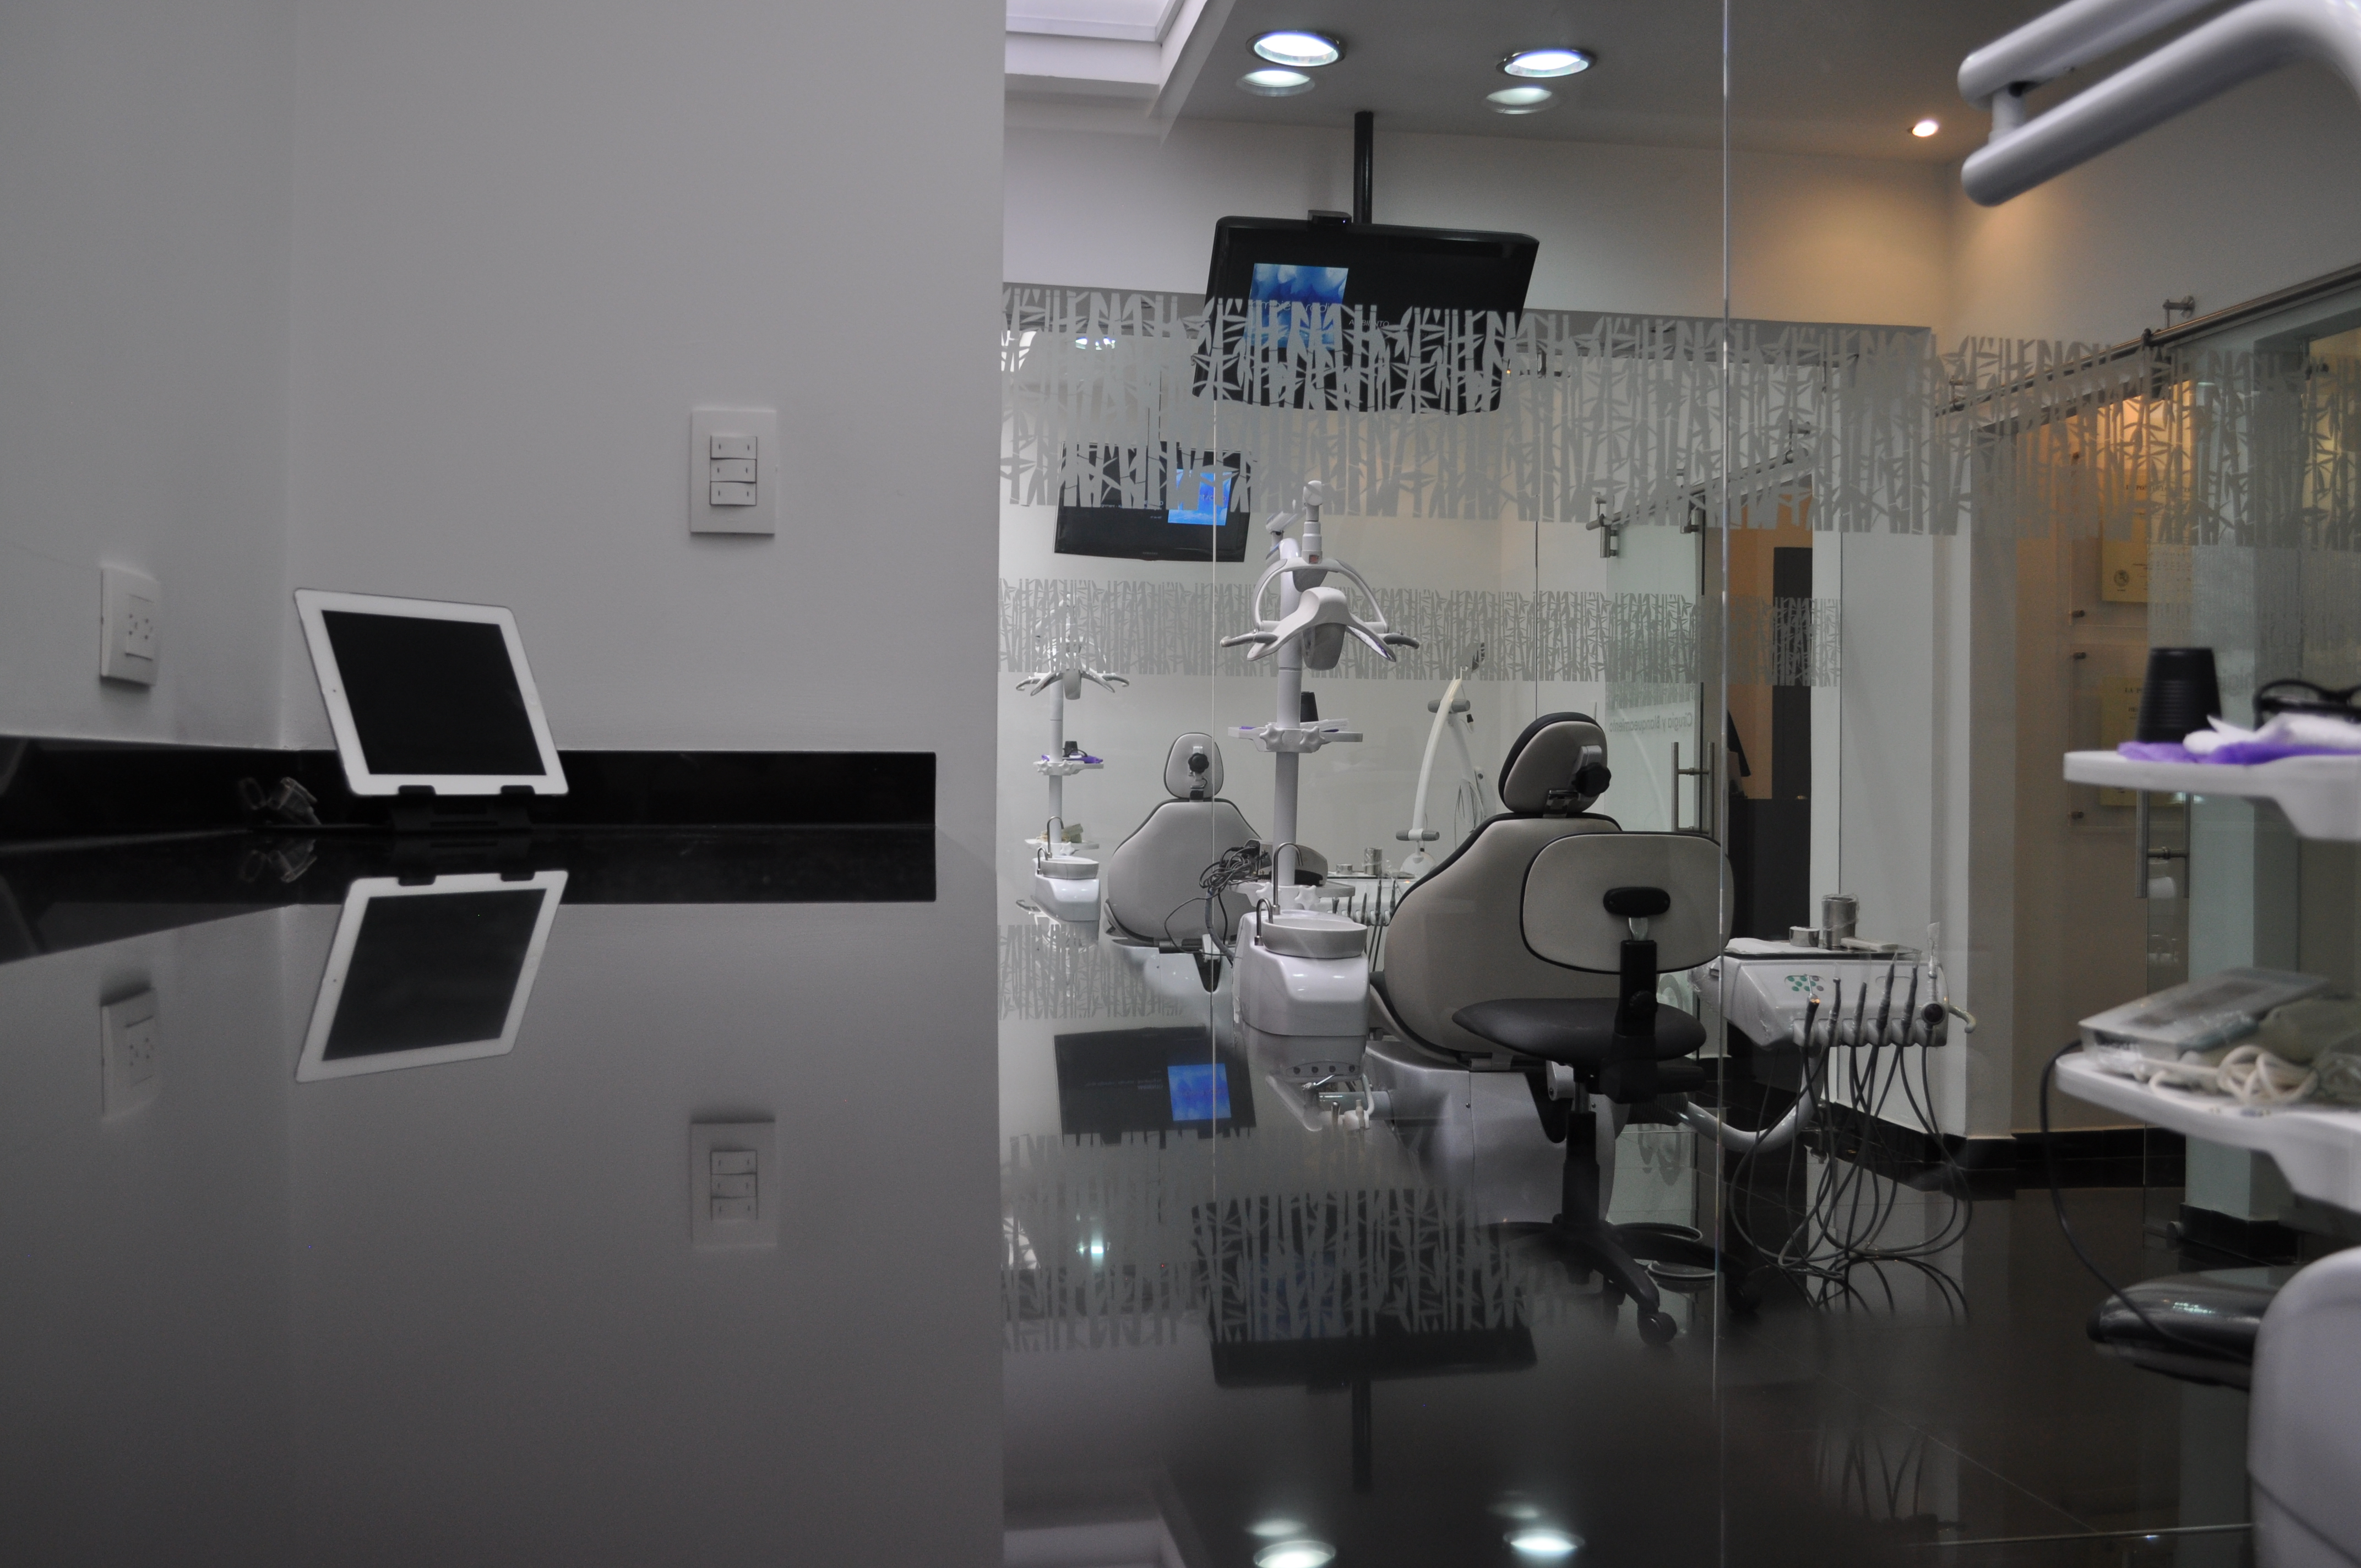 Implandent Clinica Odontologica